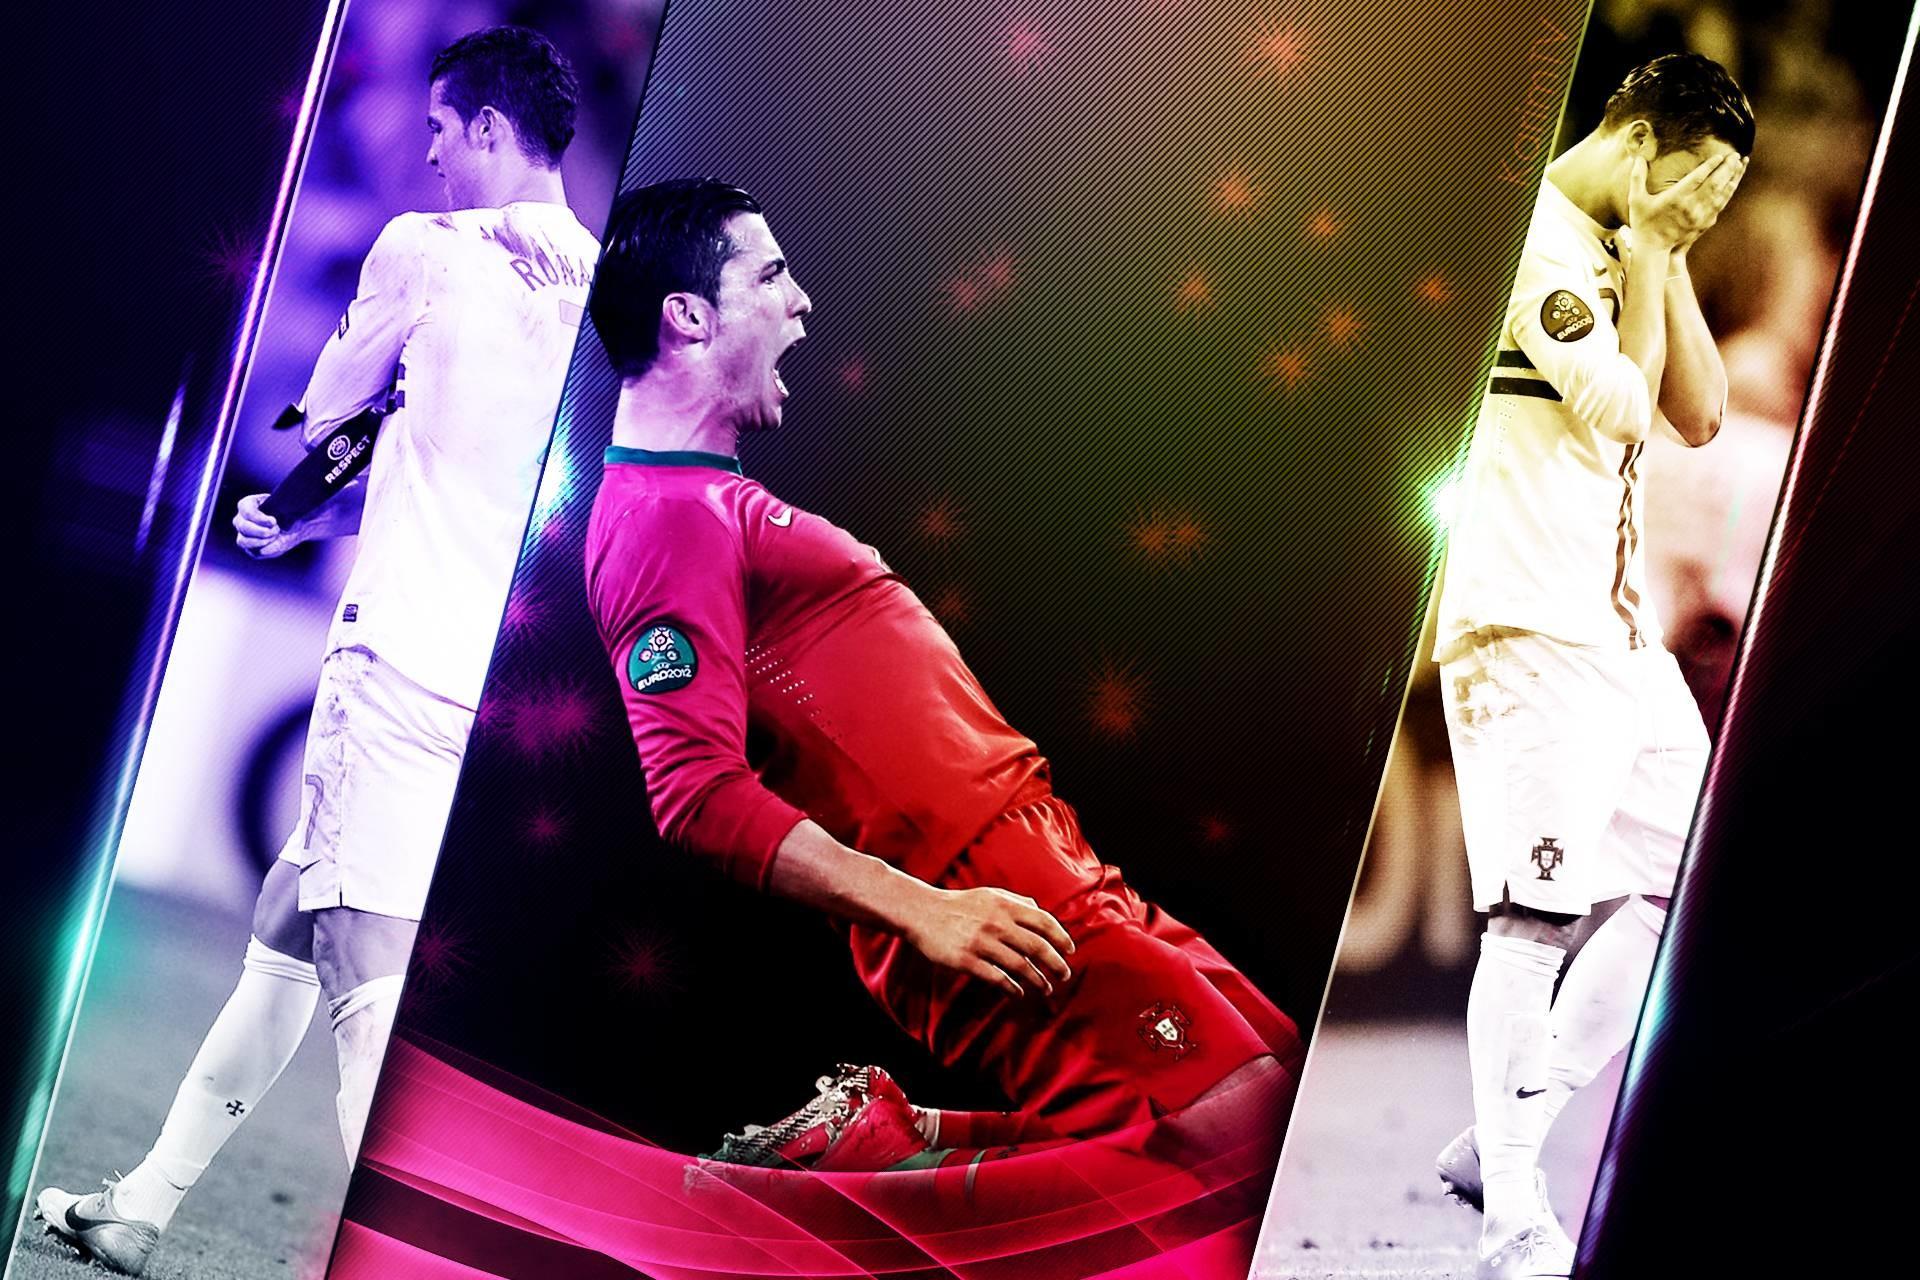 Cristiano Ronaldo And Real Madrid Wallpaper Im #5958 Wallpaper .